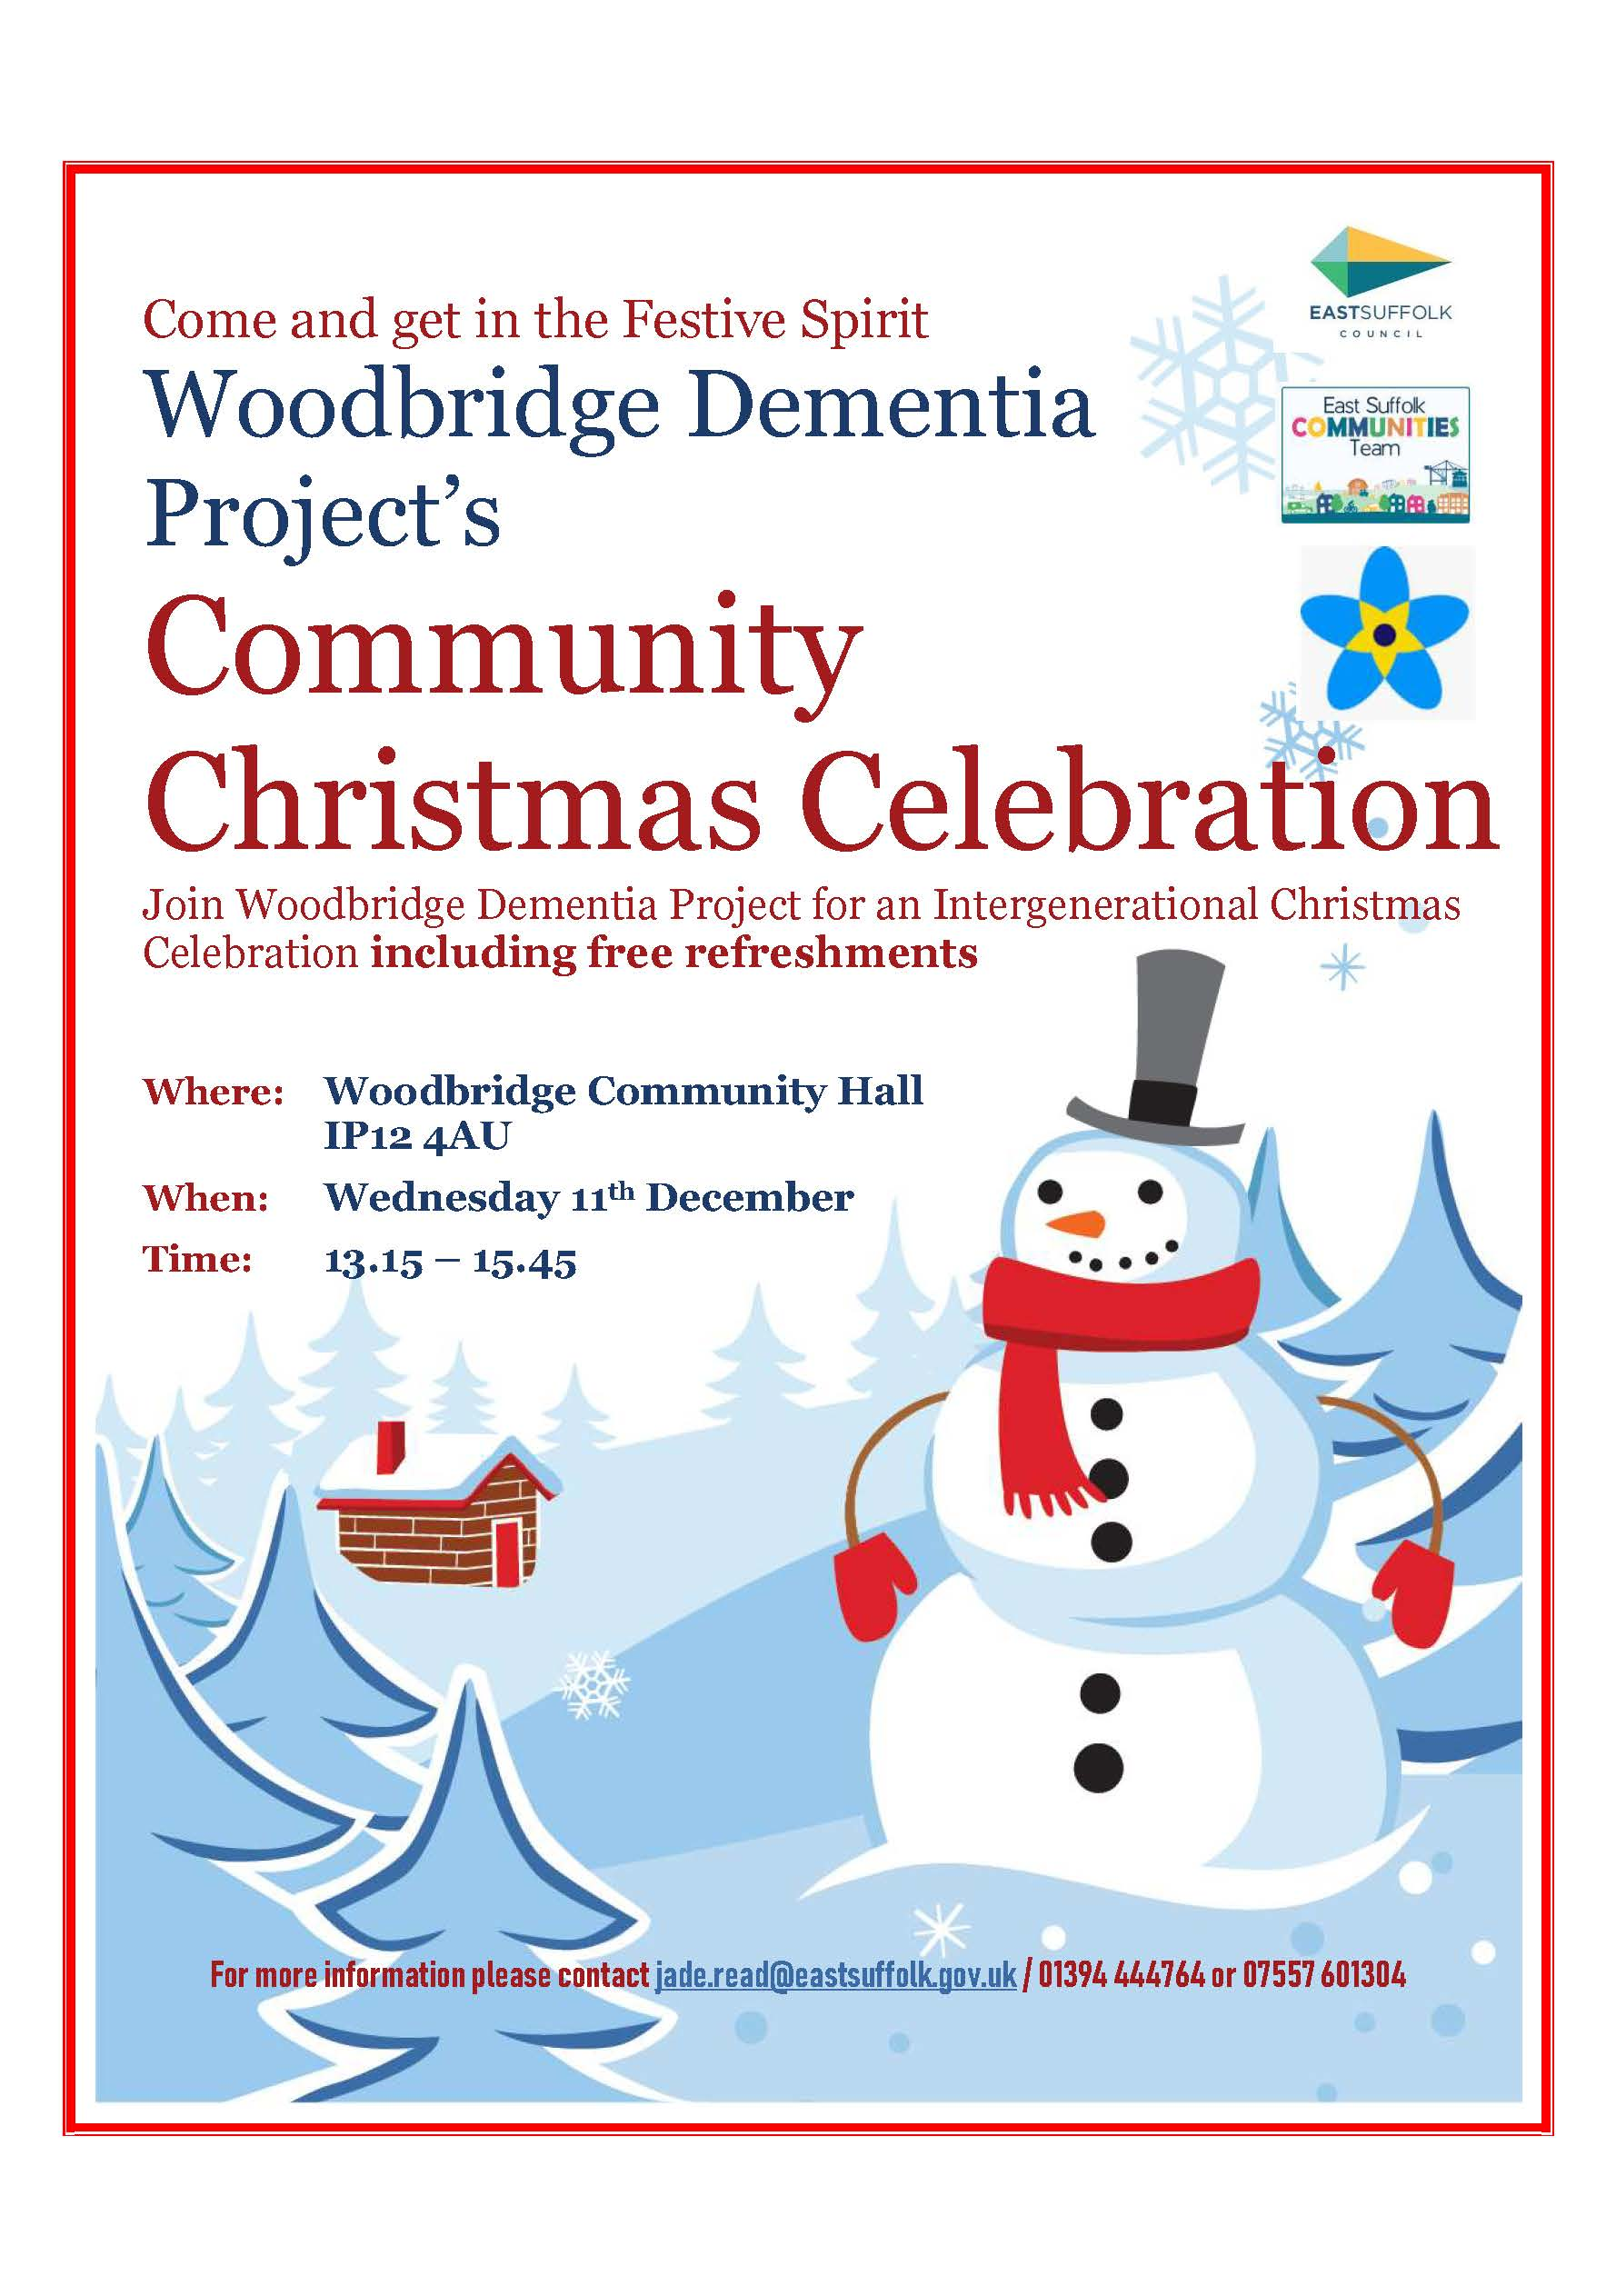 Woodbridge Dementia Project host Community Christmas Celebration